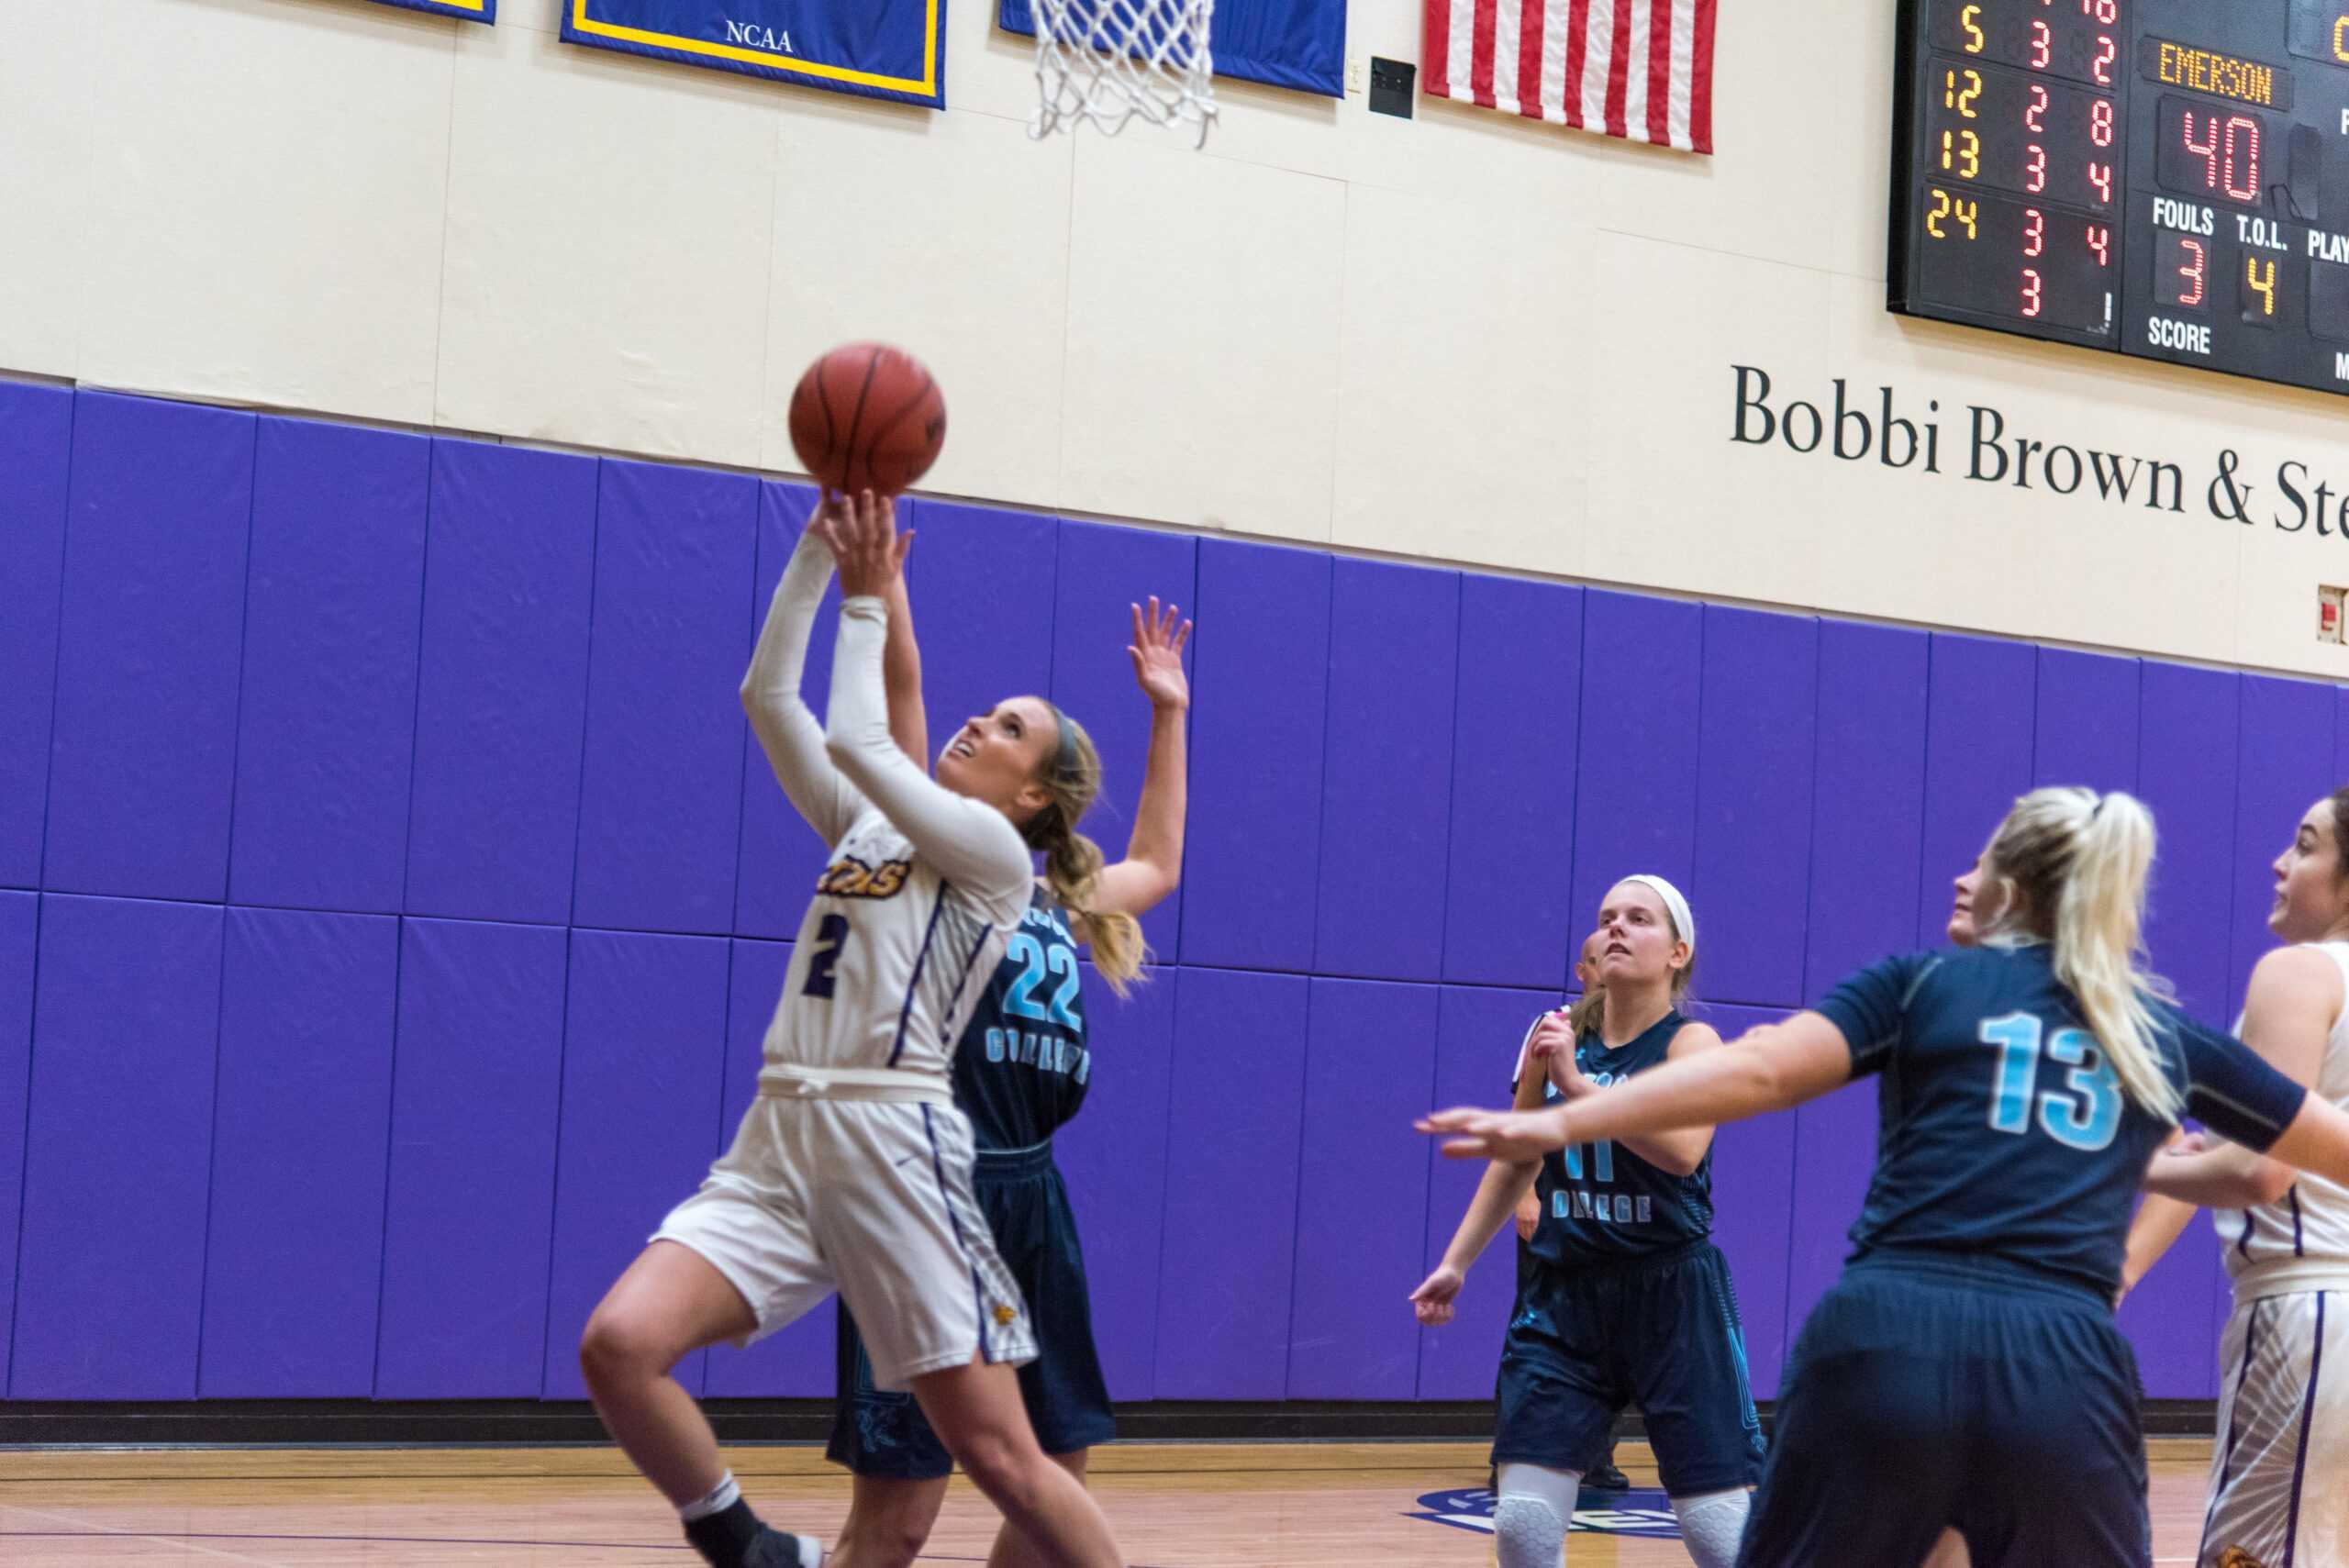 Senior Natalie Clydesdale (No. 2) drives towards the basket for a layup. Greyson Acquaviva / Beacon Staff